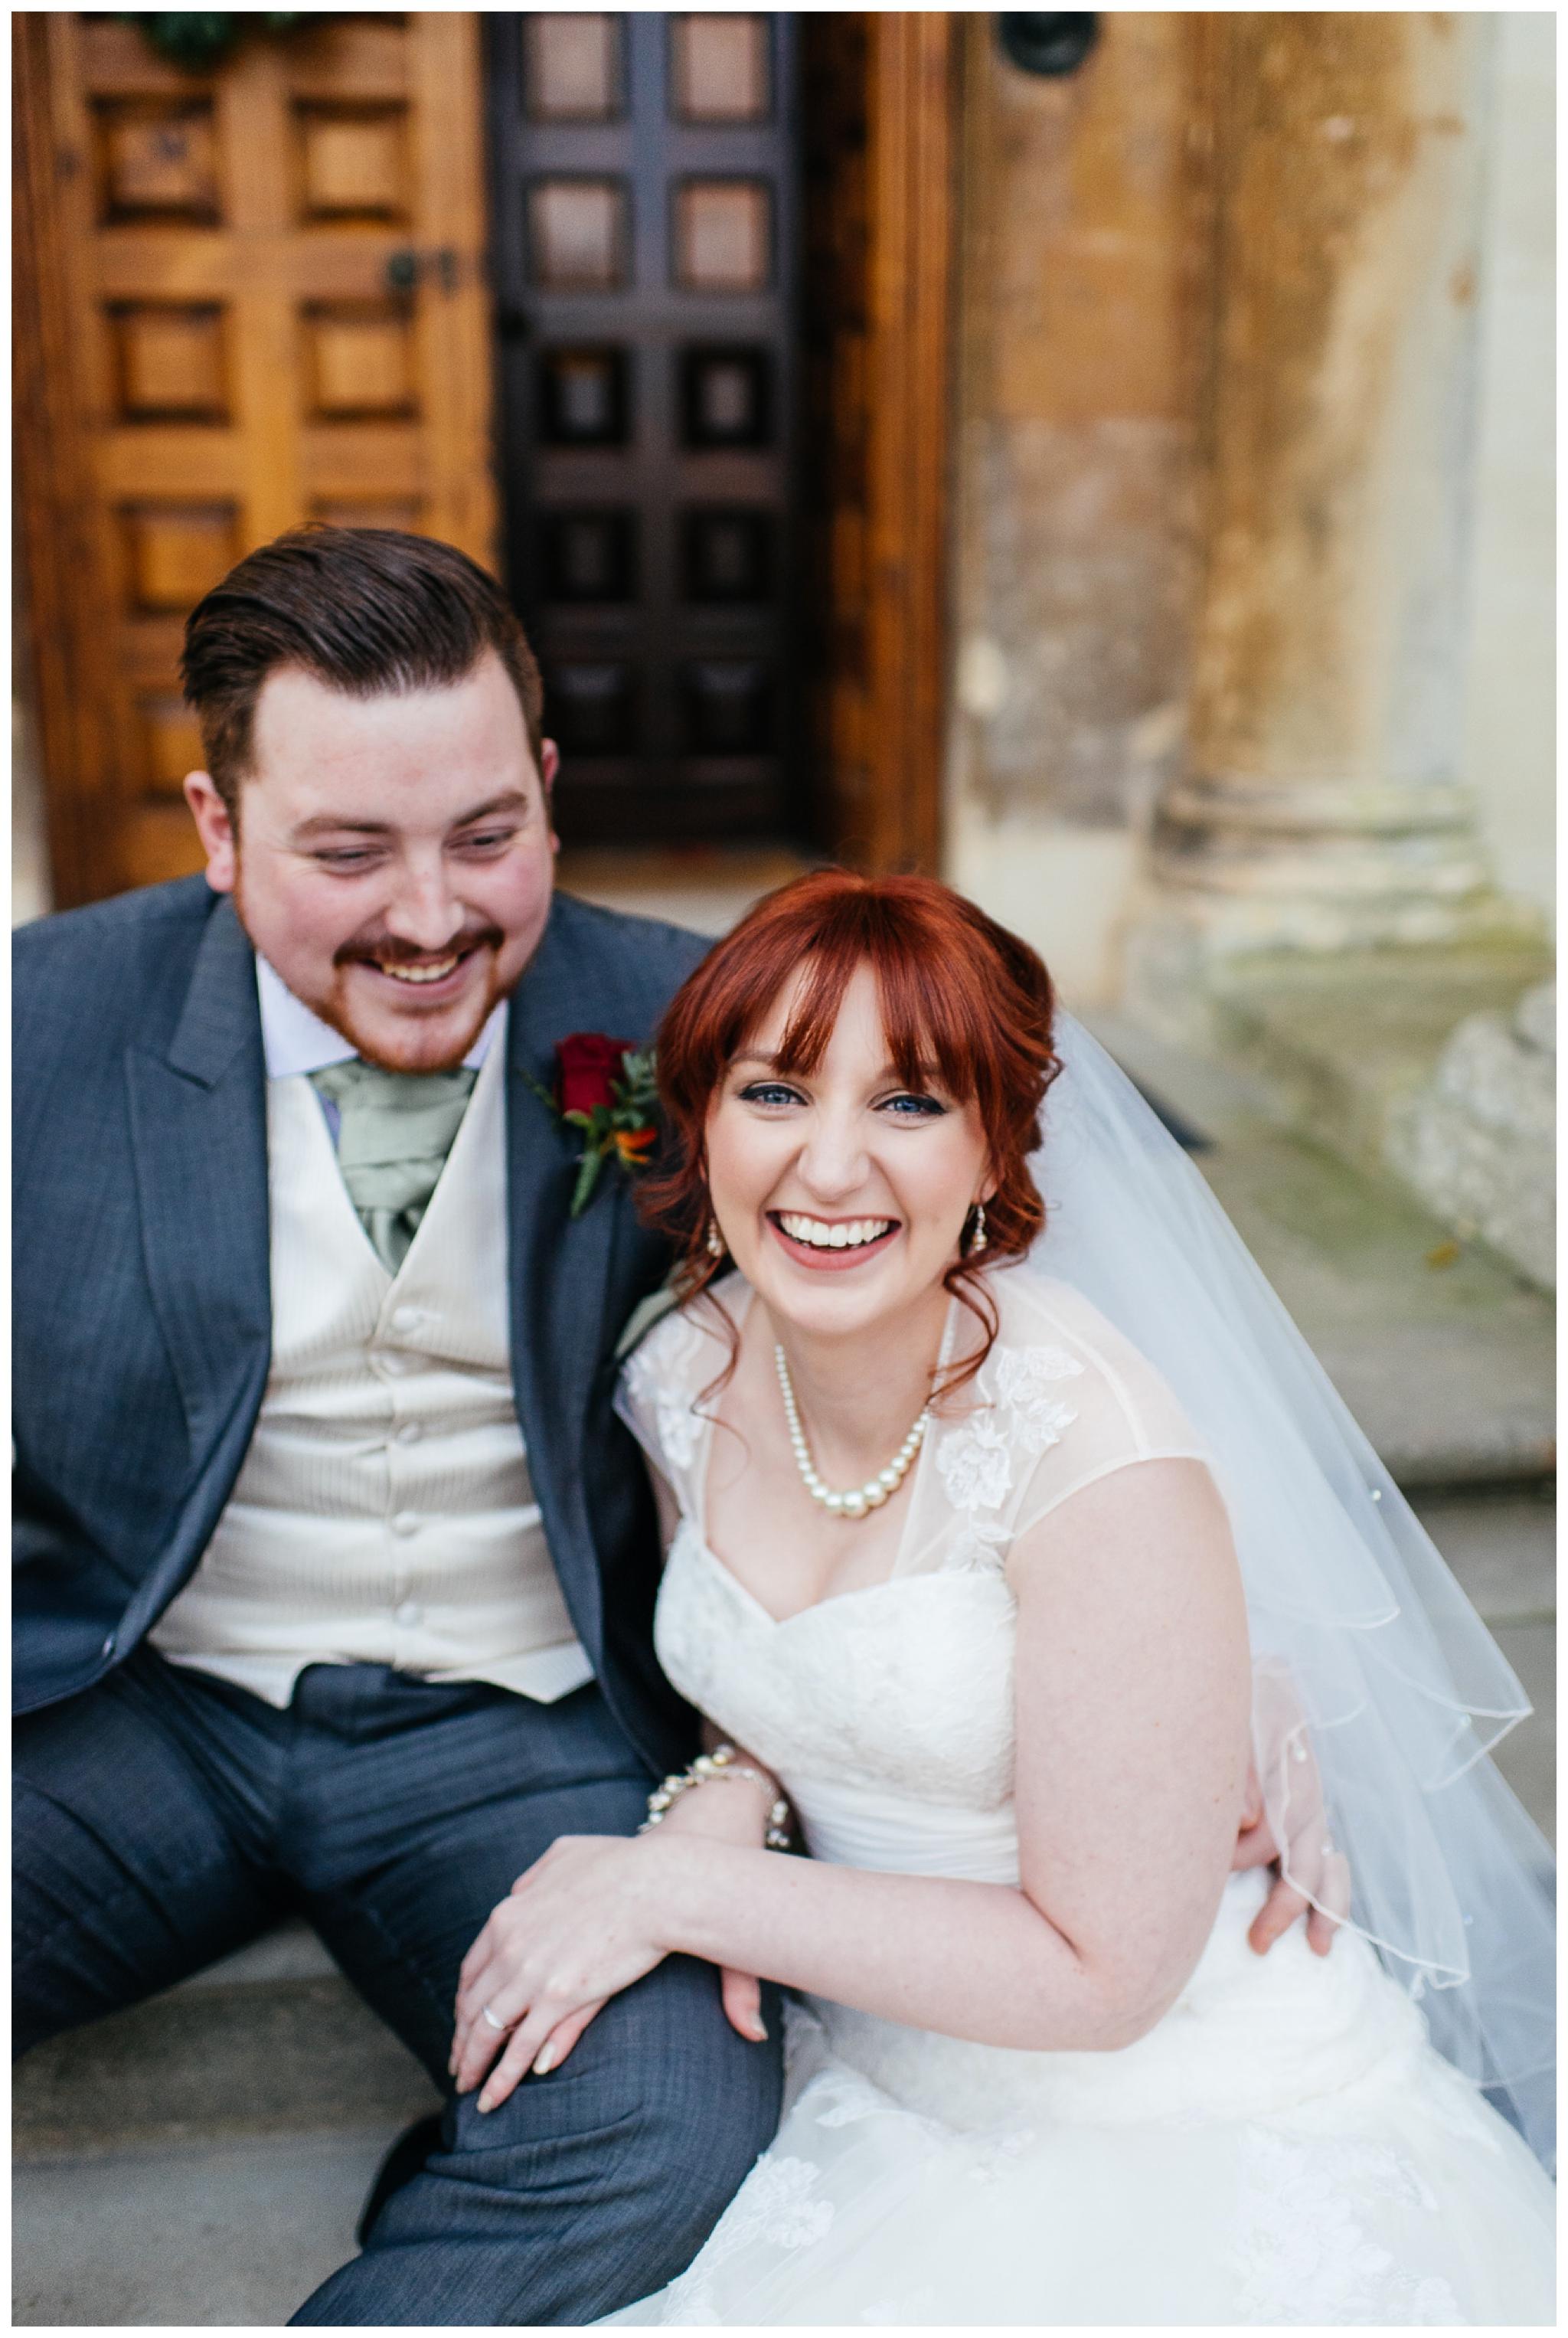 Emma&Paul-Elmore-Court-Winter-Wedding-Nikki-Cooper-Photography_0073.jpg